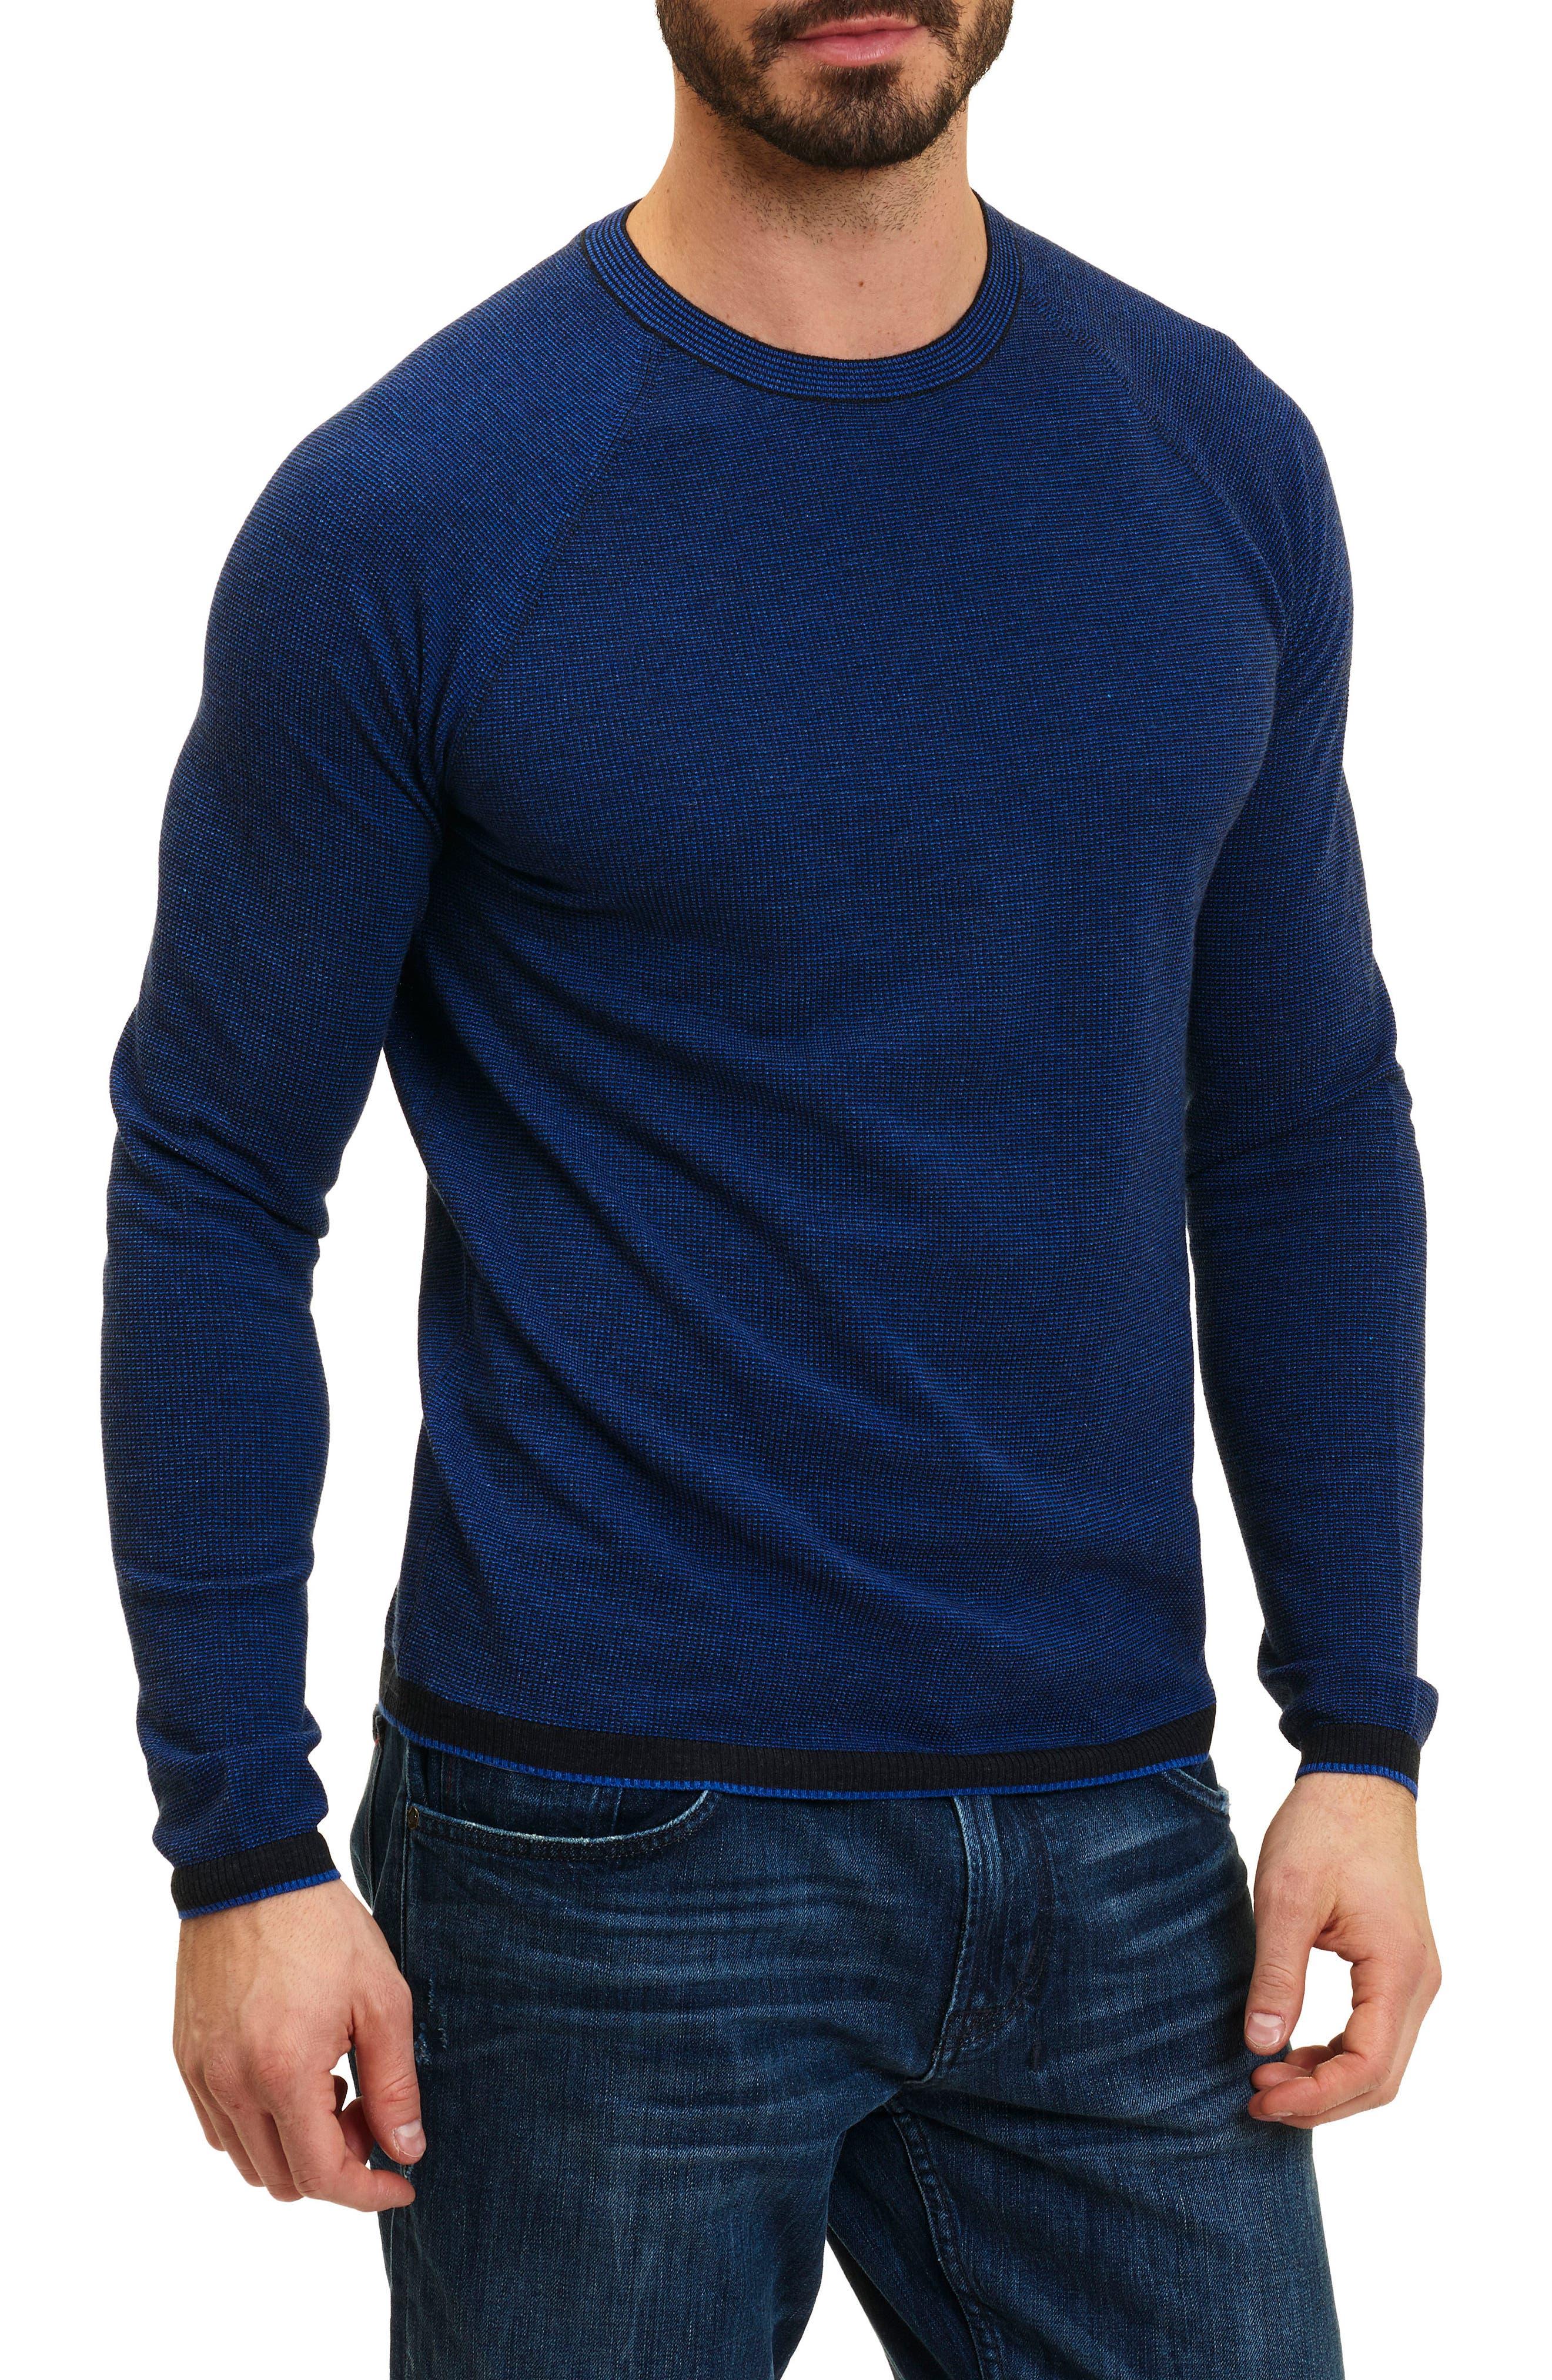 Main Image - Robert Graham Ray Brook Wool Blend Sweater